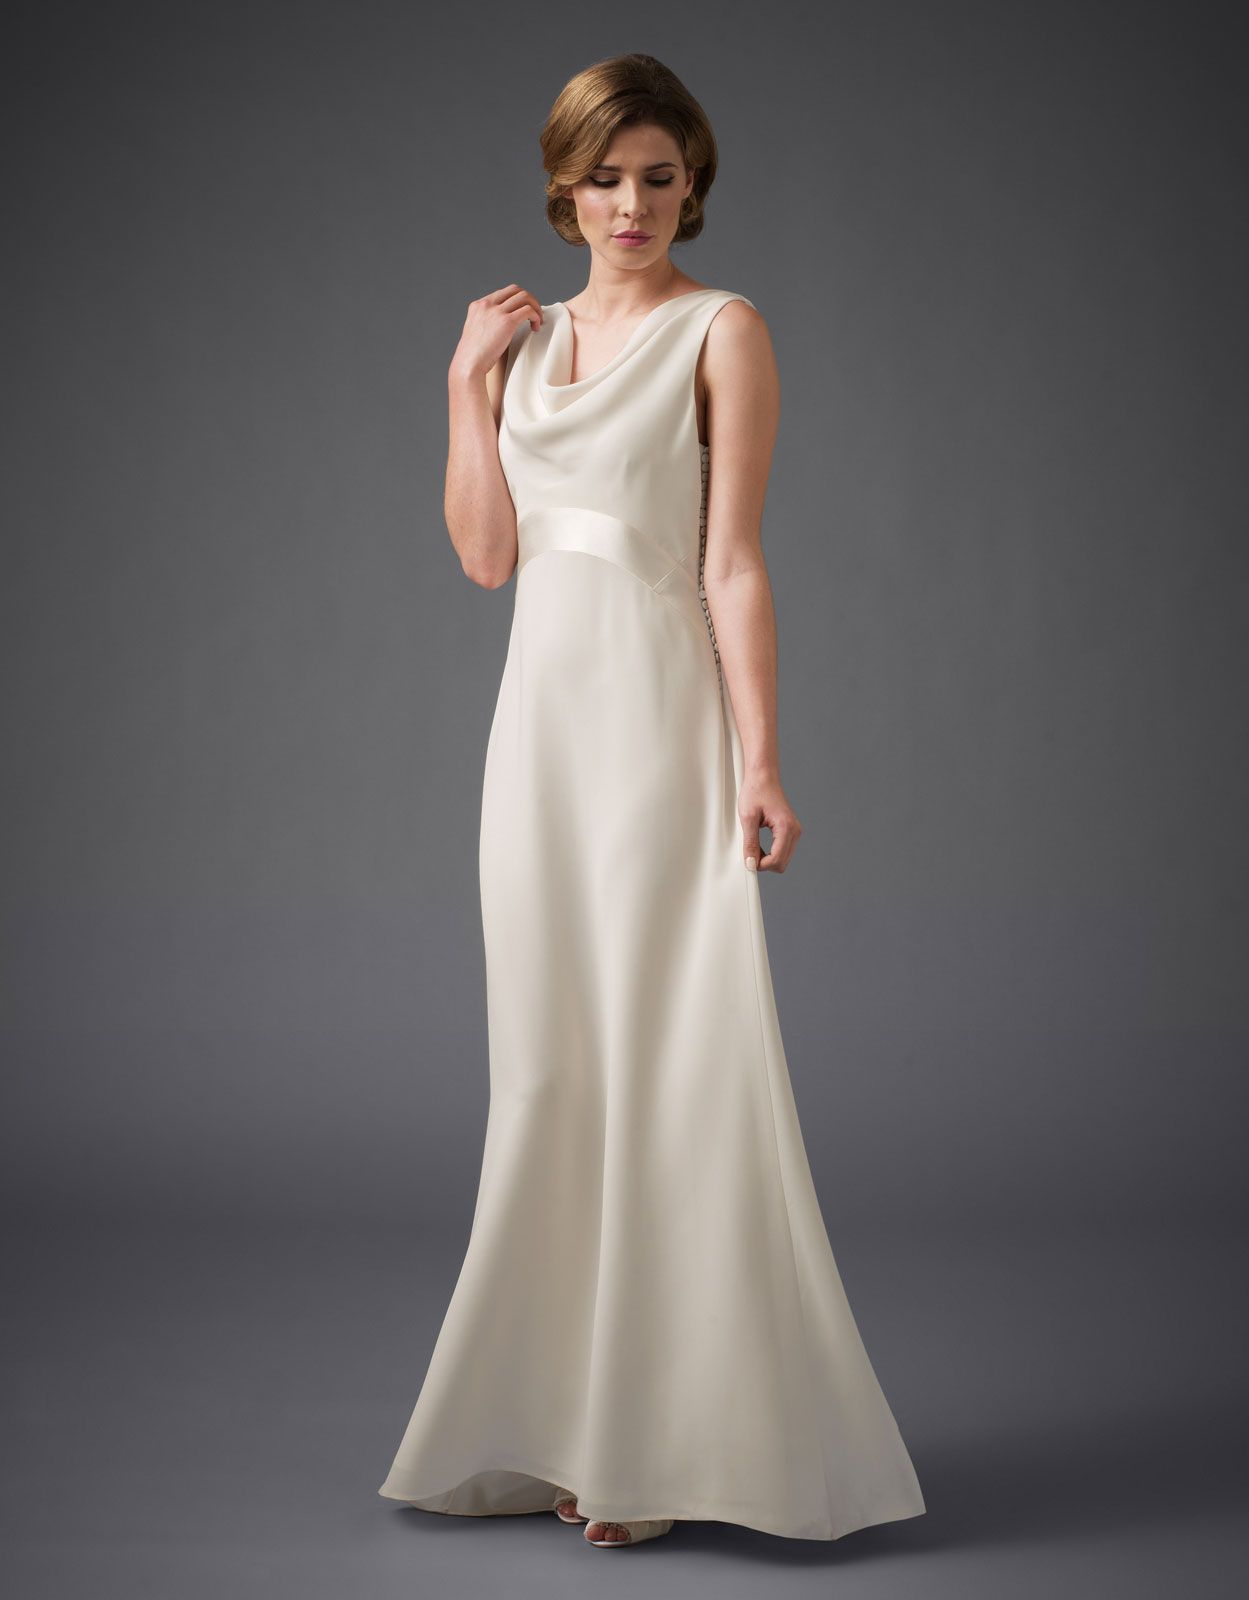 Vintage Princess Ball Gown Wedding Dress   Stella York